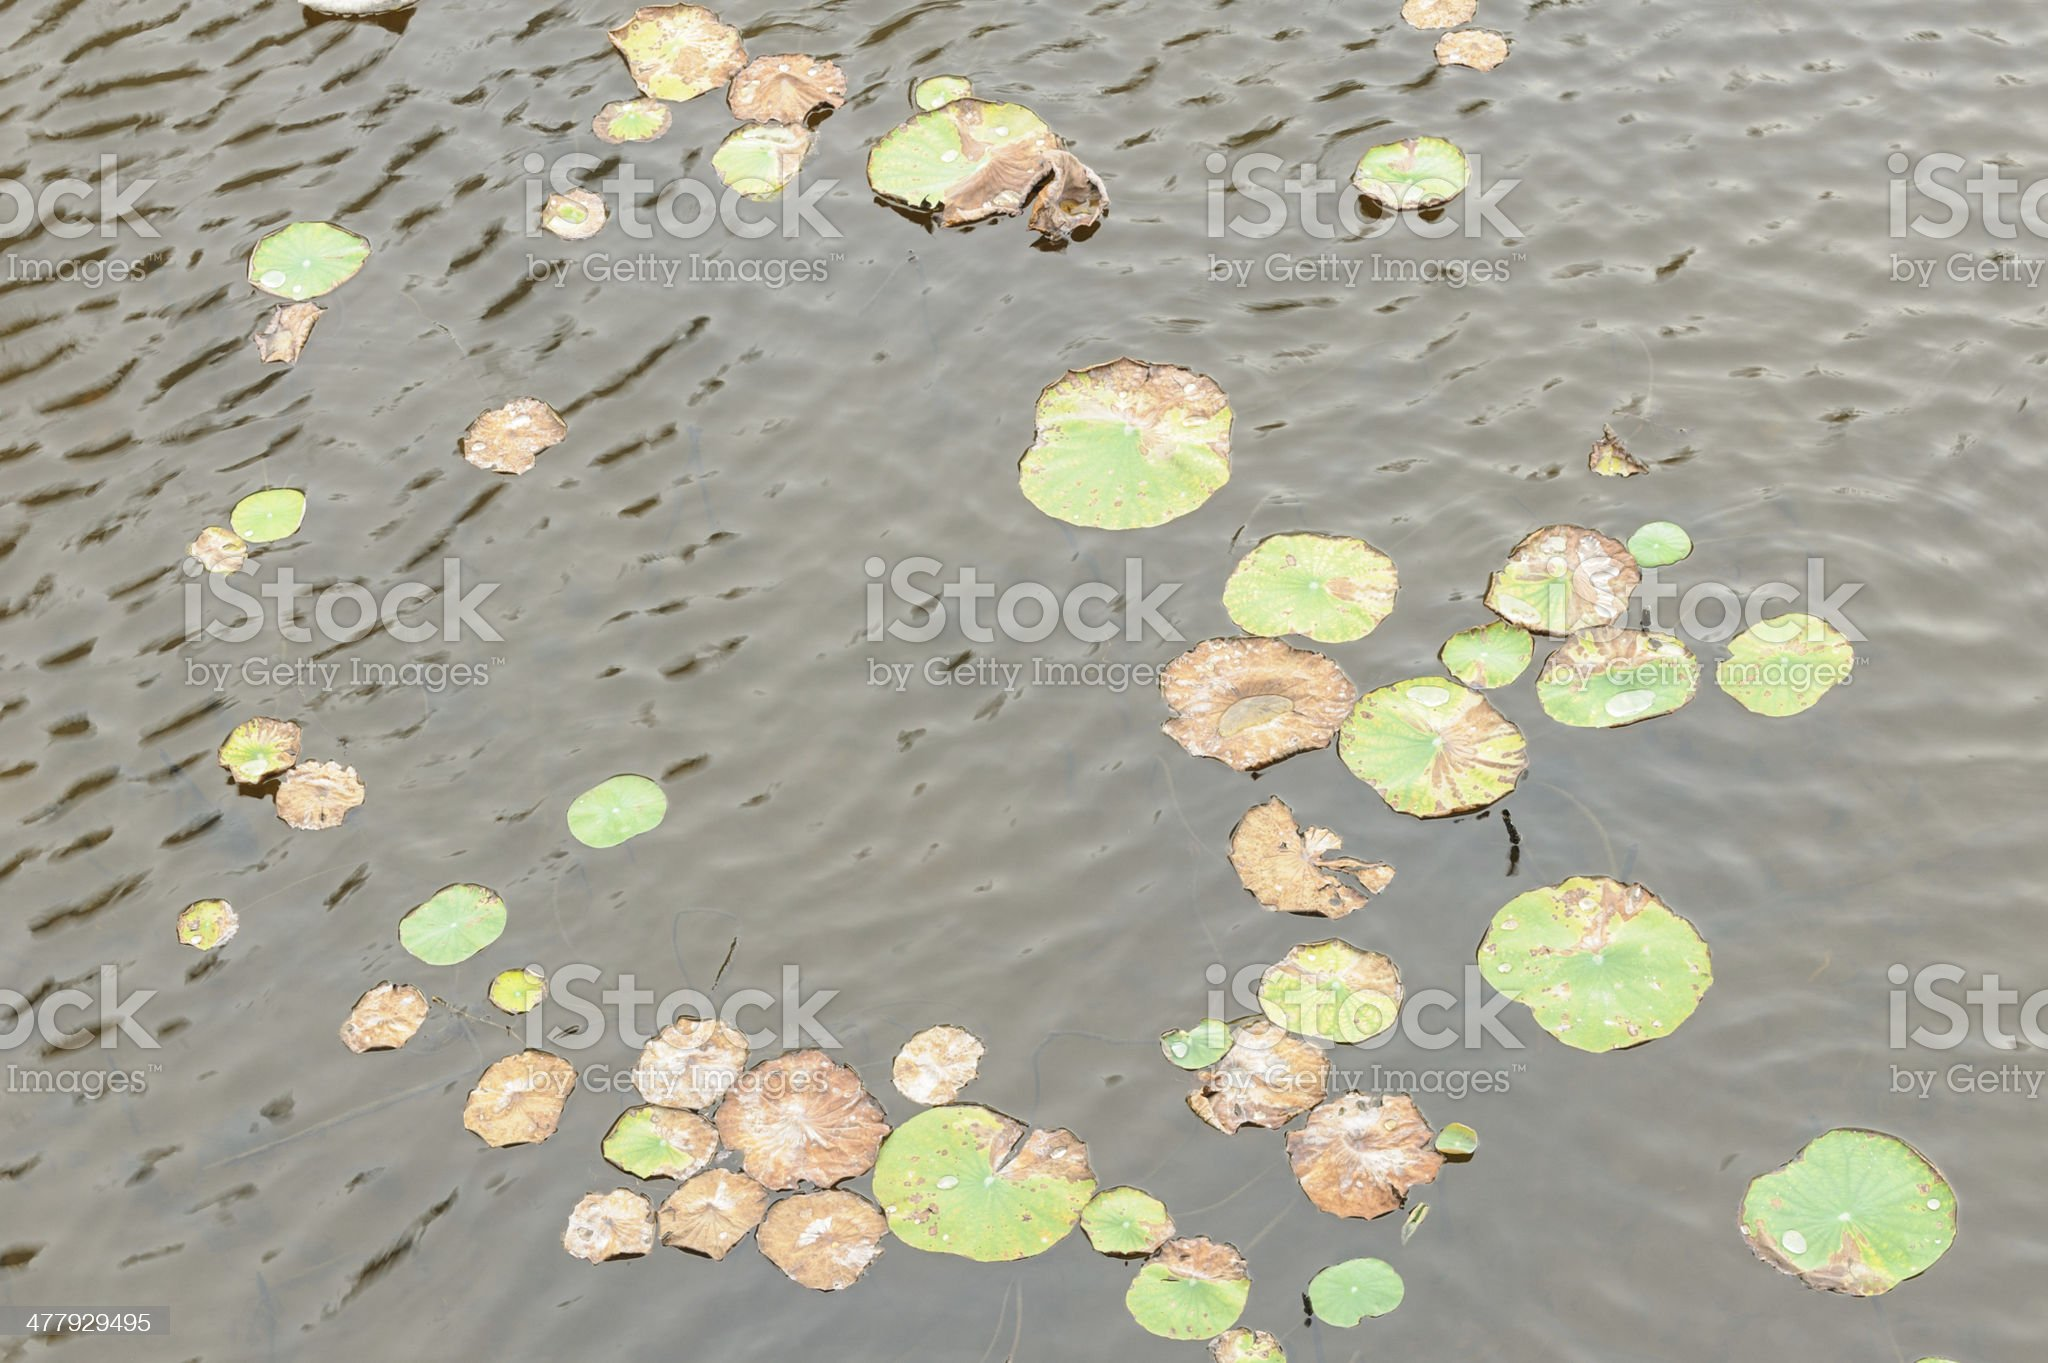 Lotus leaf in water royalty-free stock photo